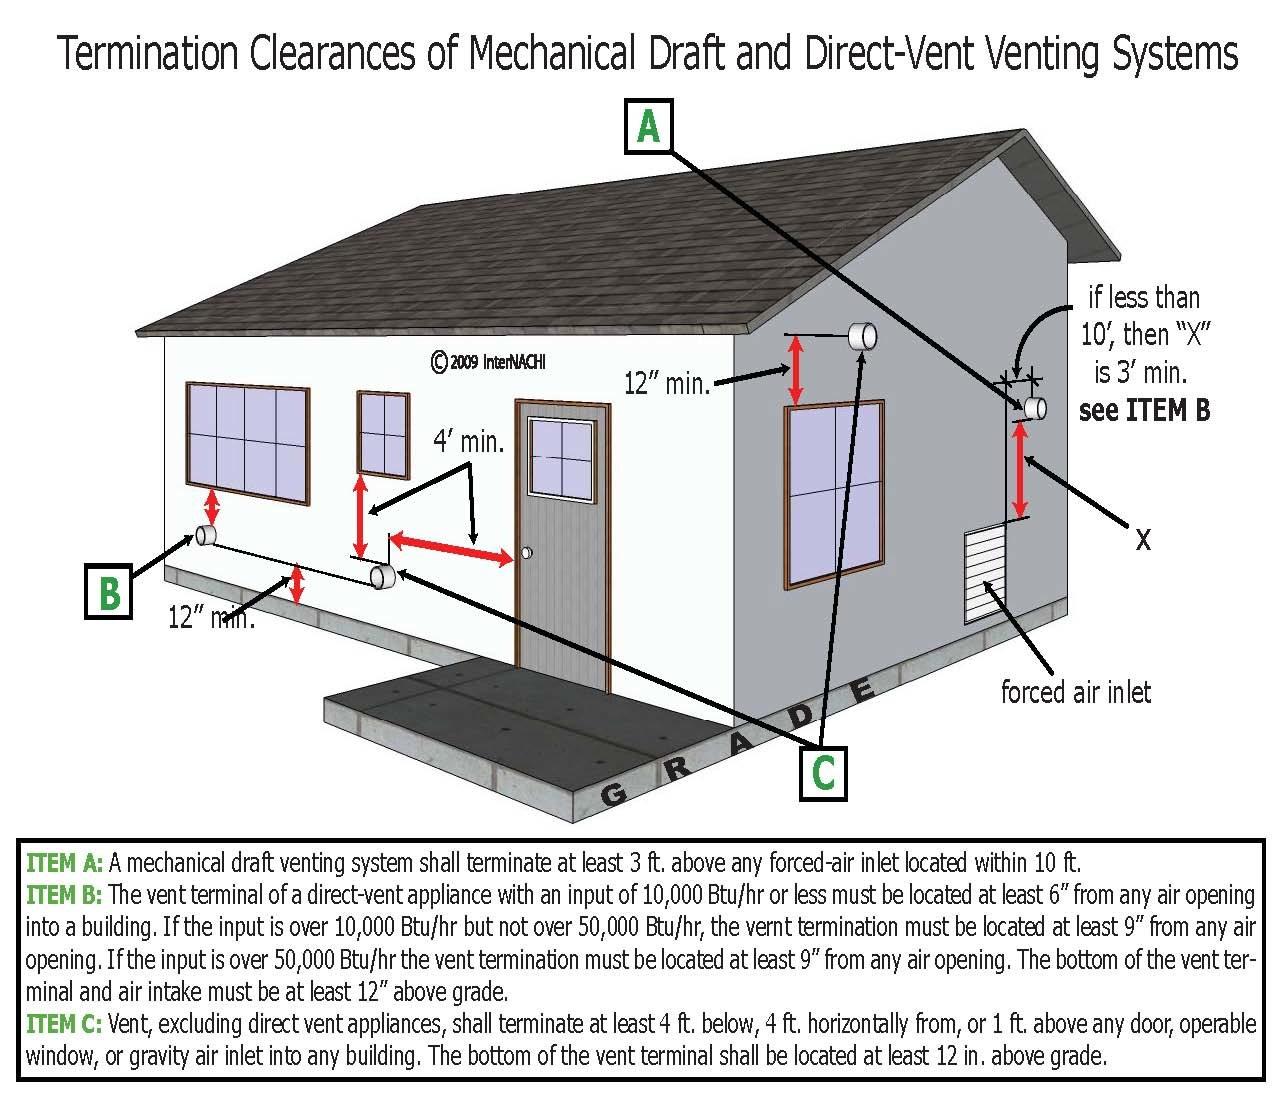 HVAC venting temination clearances.